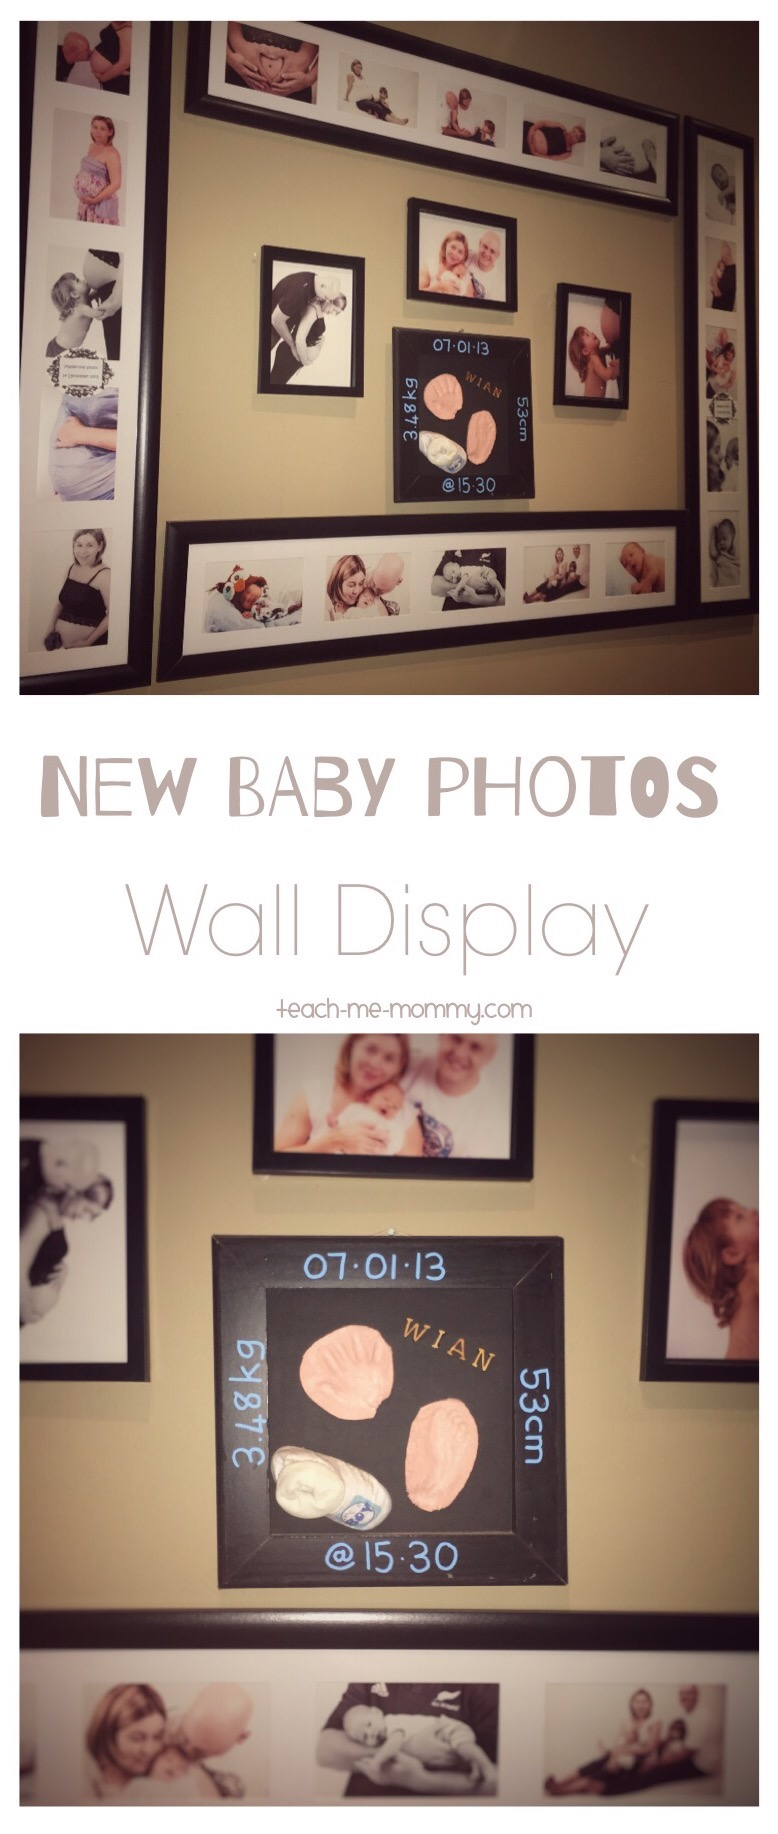 New Baby photo wall display